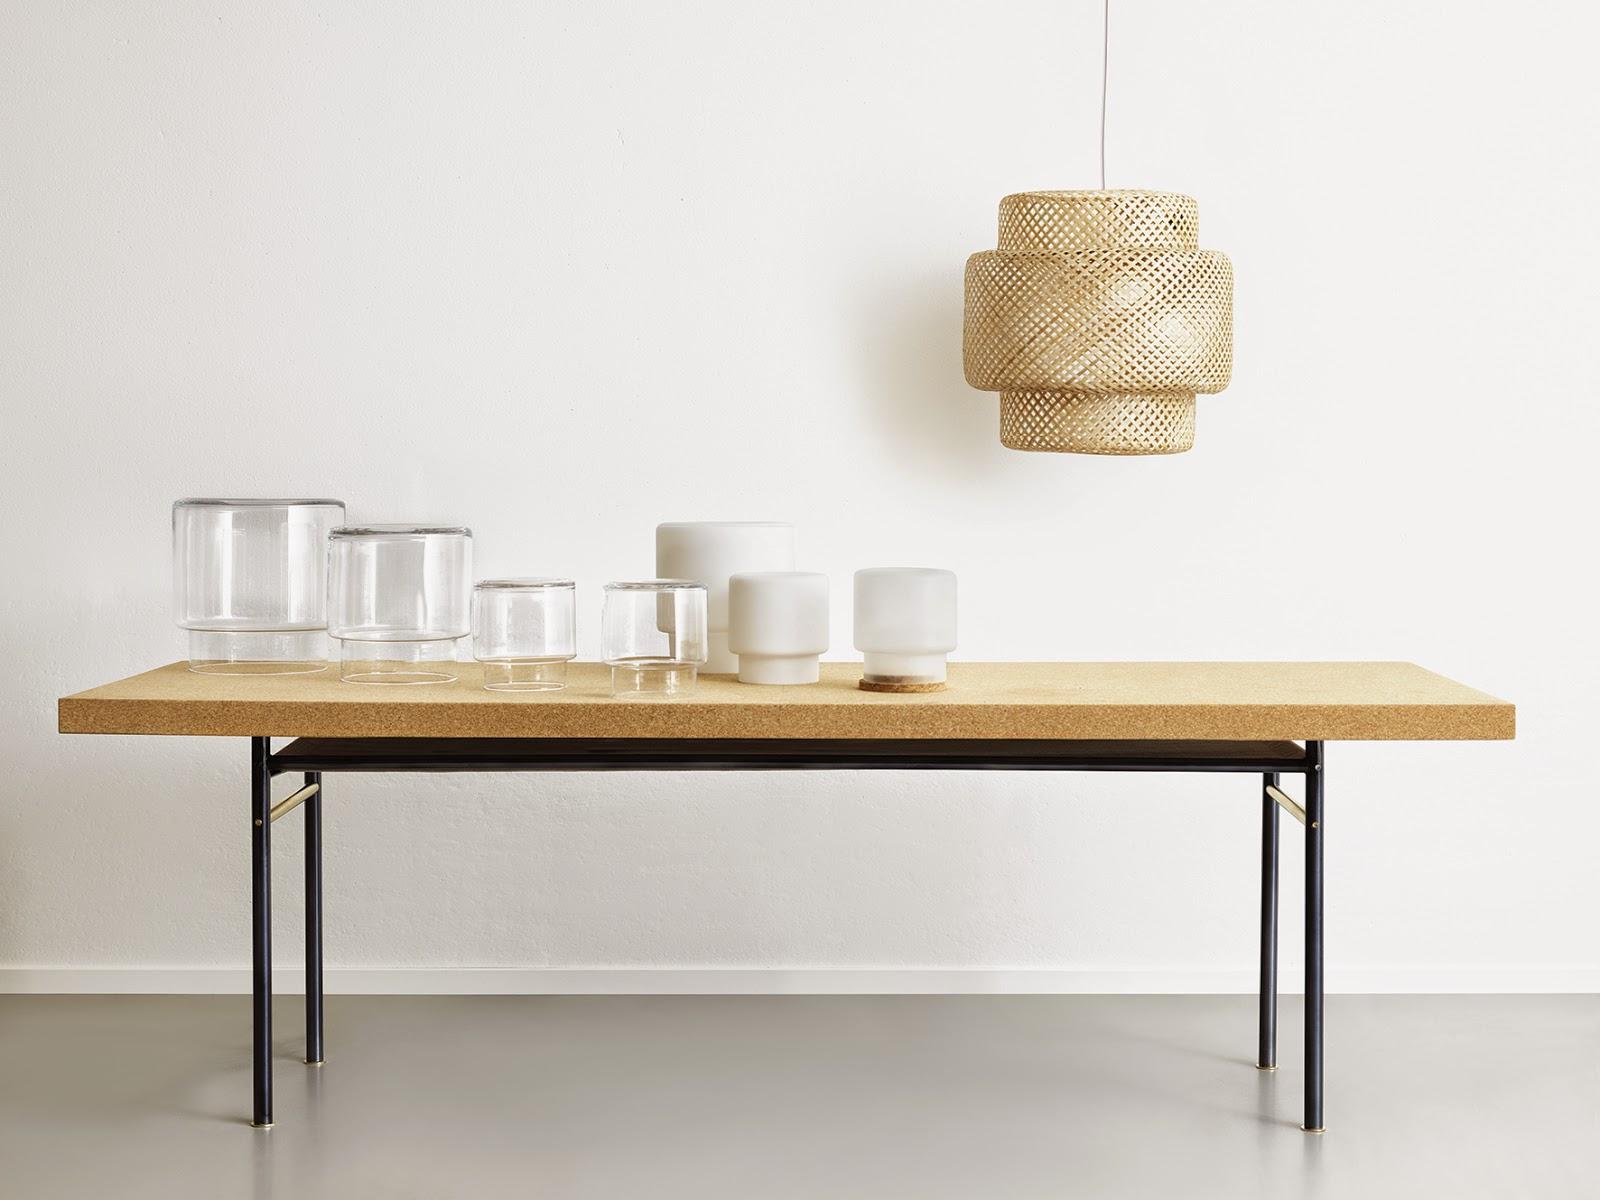 Ikea ilse crawford 6+(1)